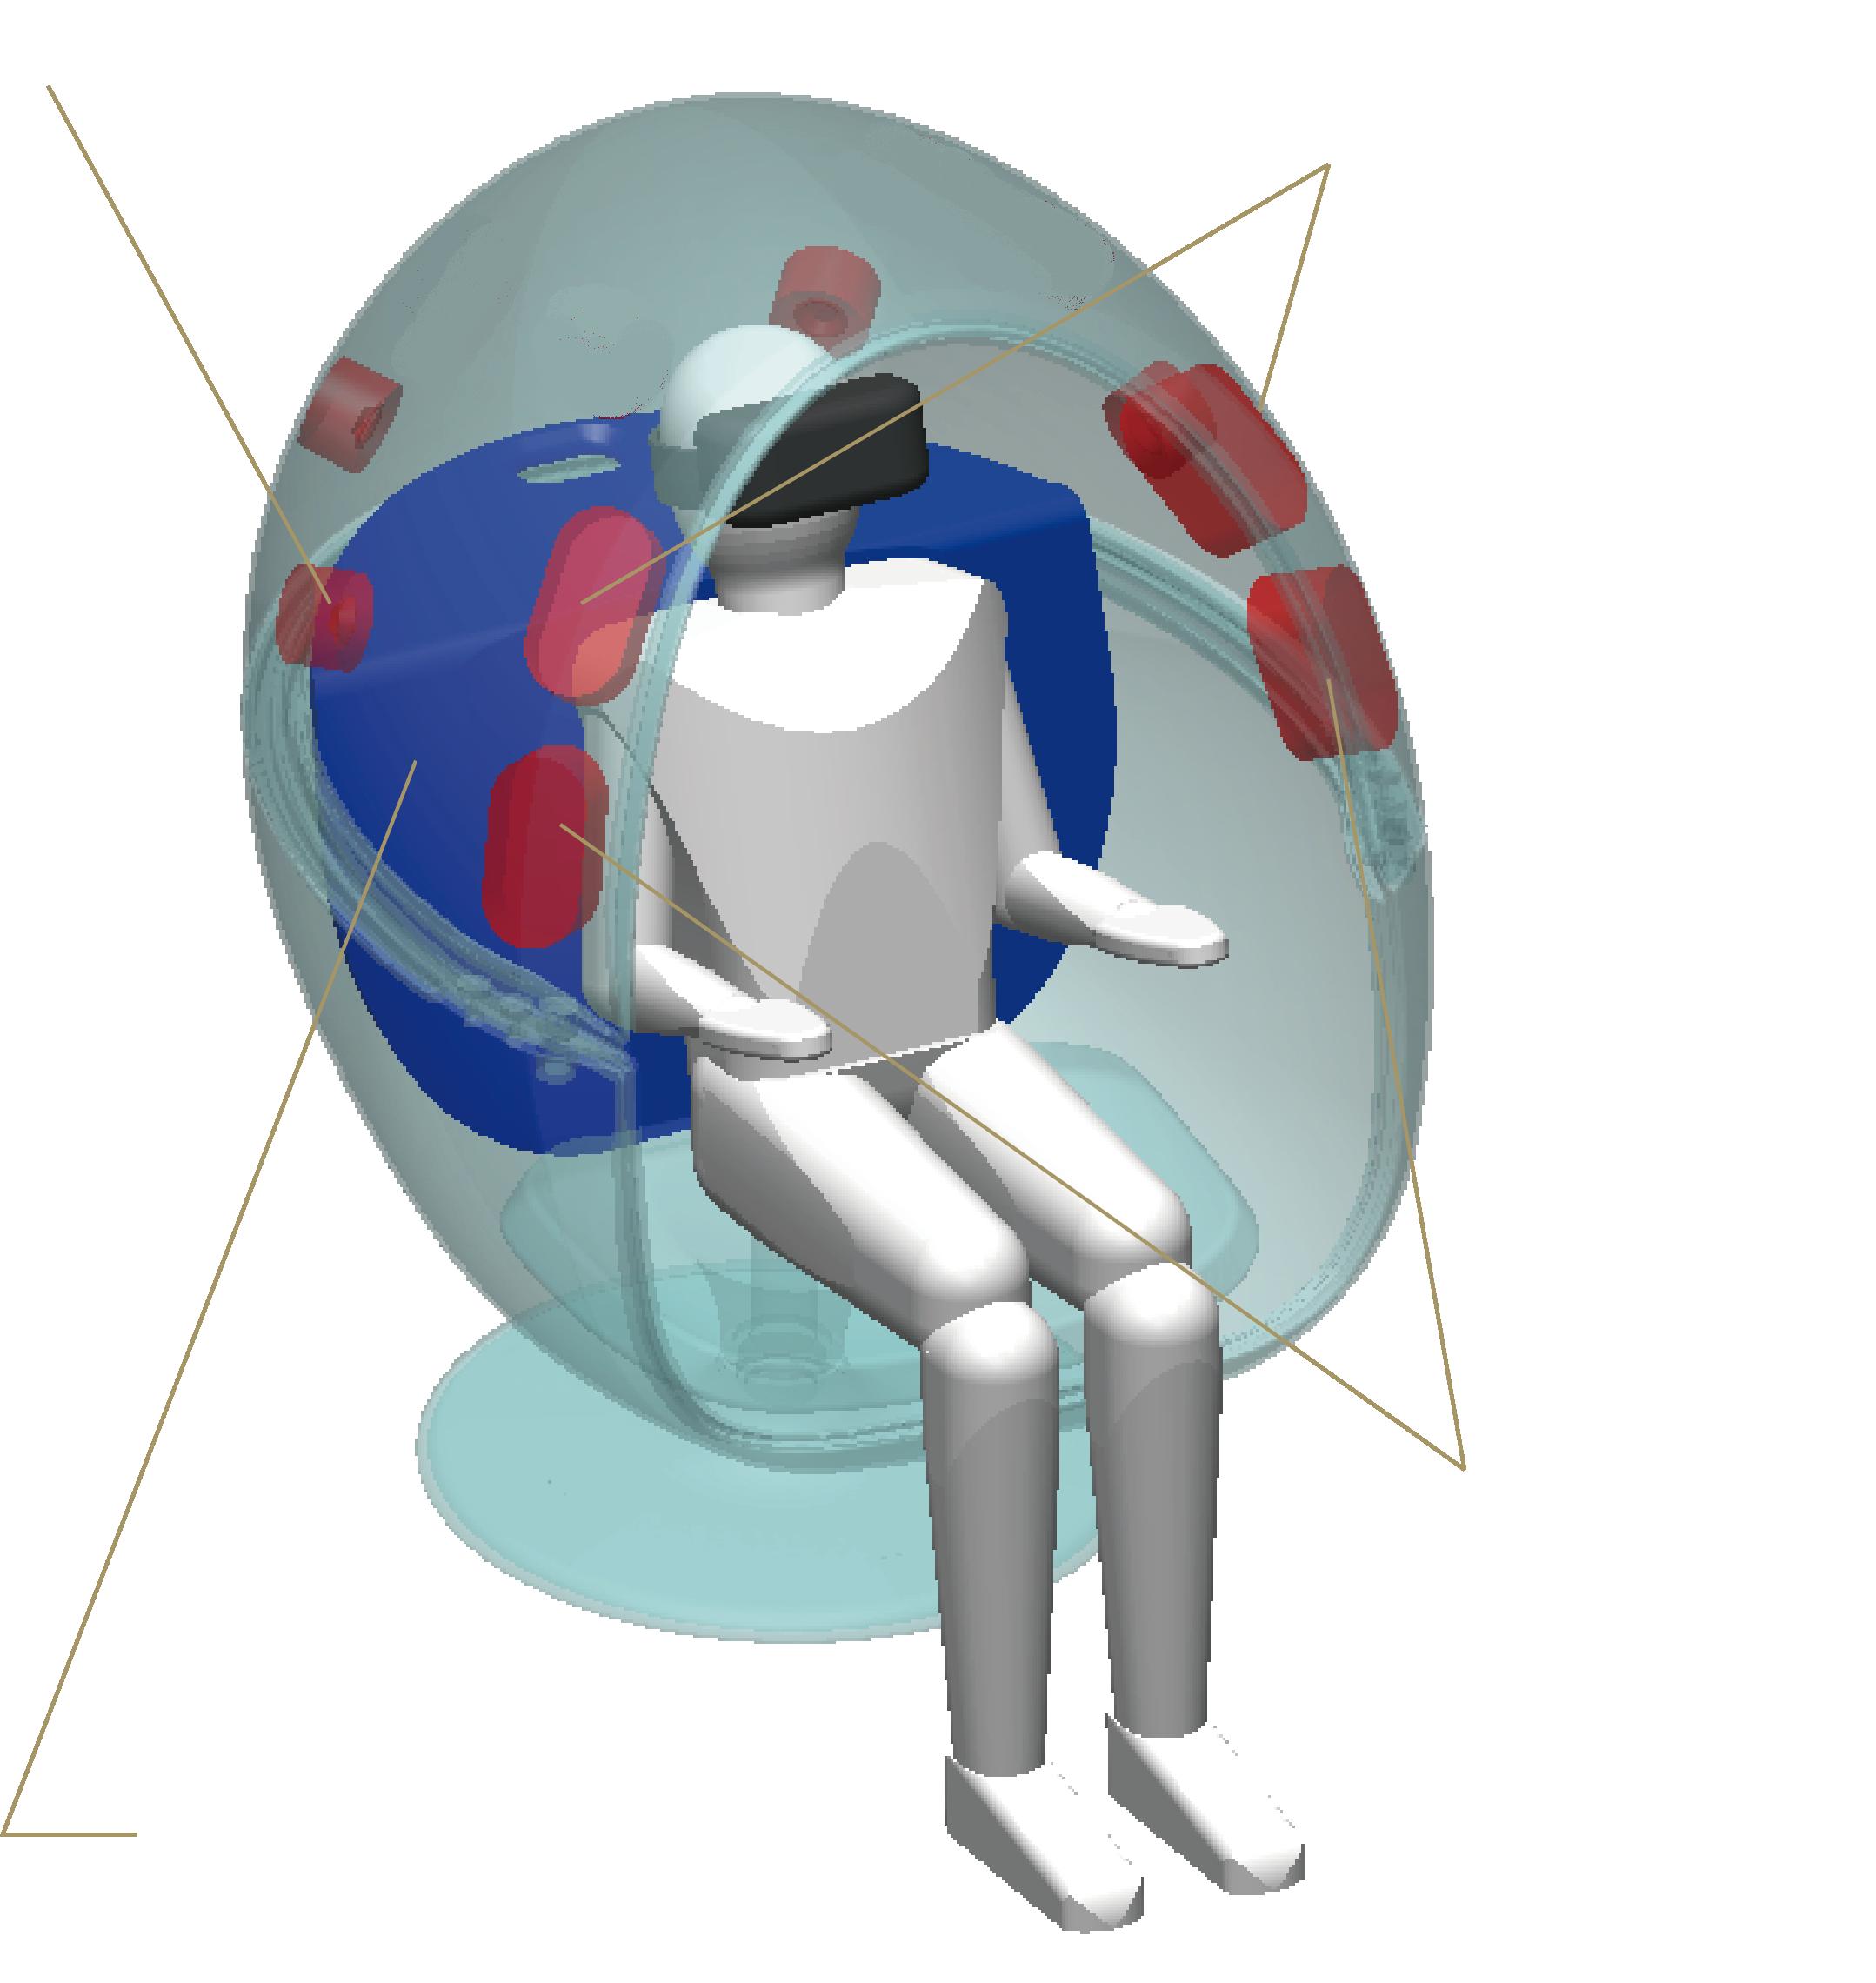 VRS2のスピーカーユニット配置イメージ図